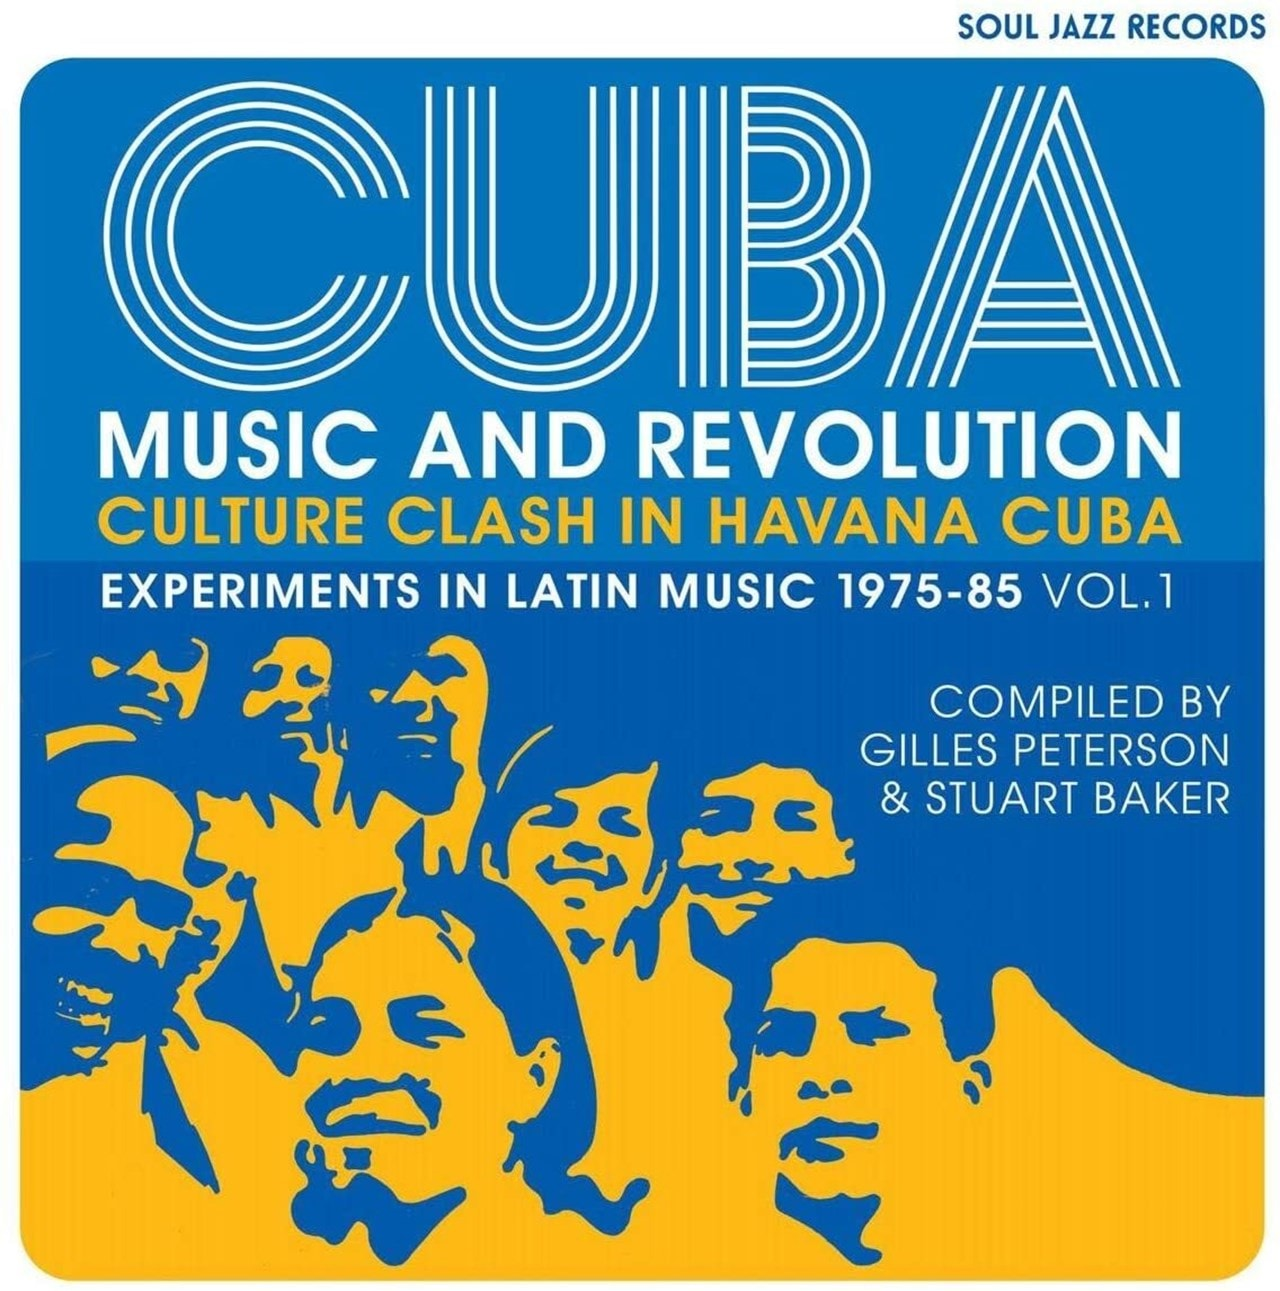 CUBA: Music and Revolution - Culture Clash in Havana: Experiments in Latin Music 1975-85 - Volume 1 - 1